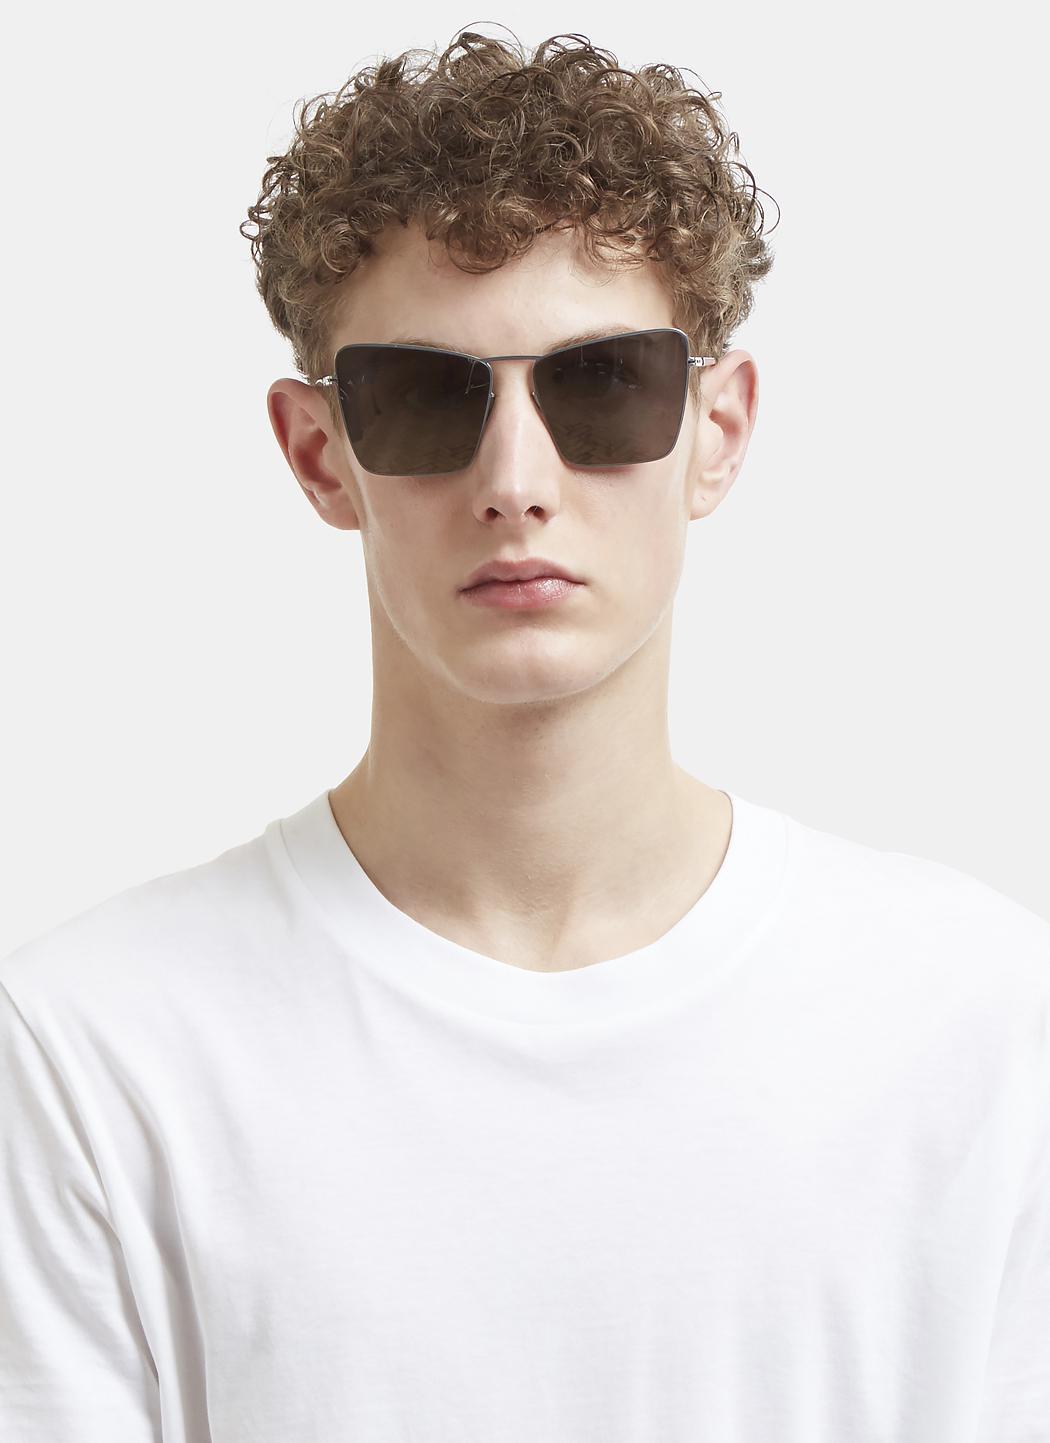 Mykita X Maison Margiela Mmesse014 Sunglasses In Silver in Metallic for Men